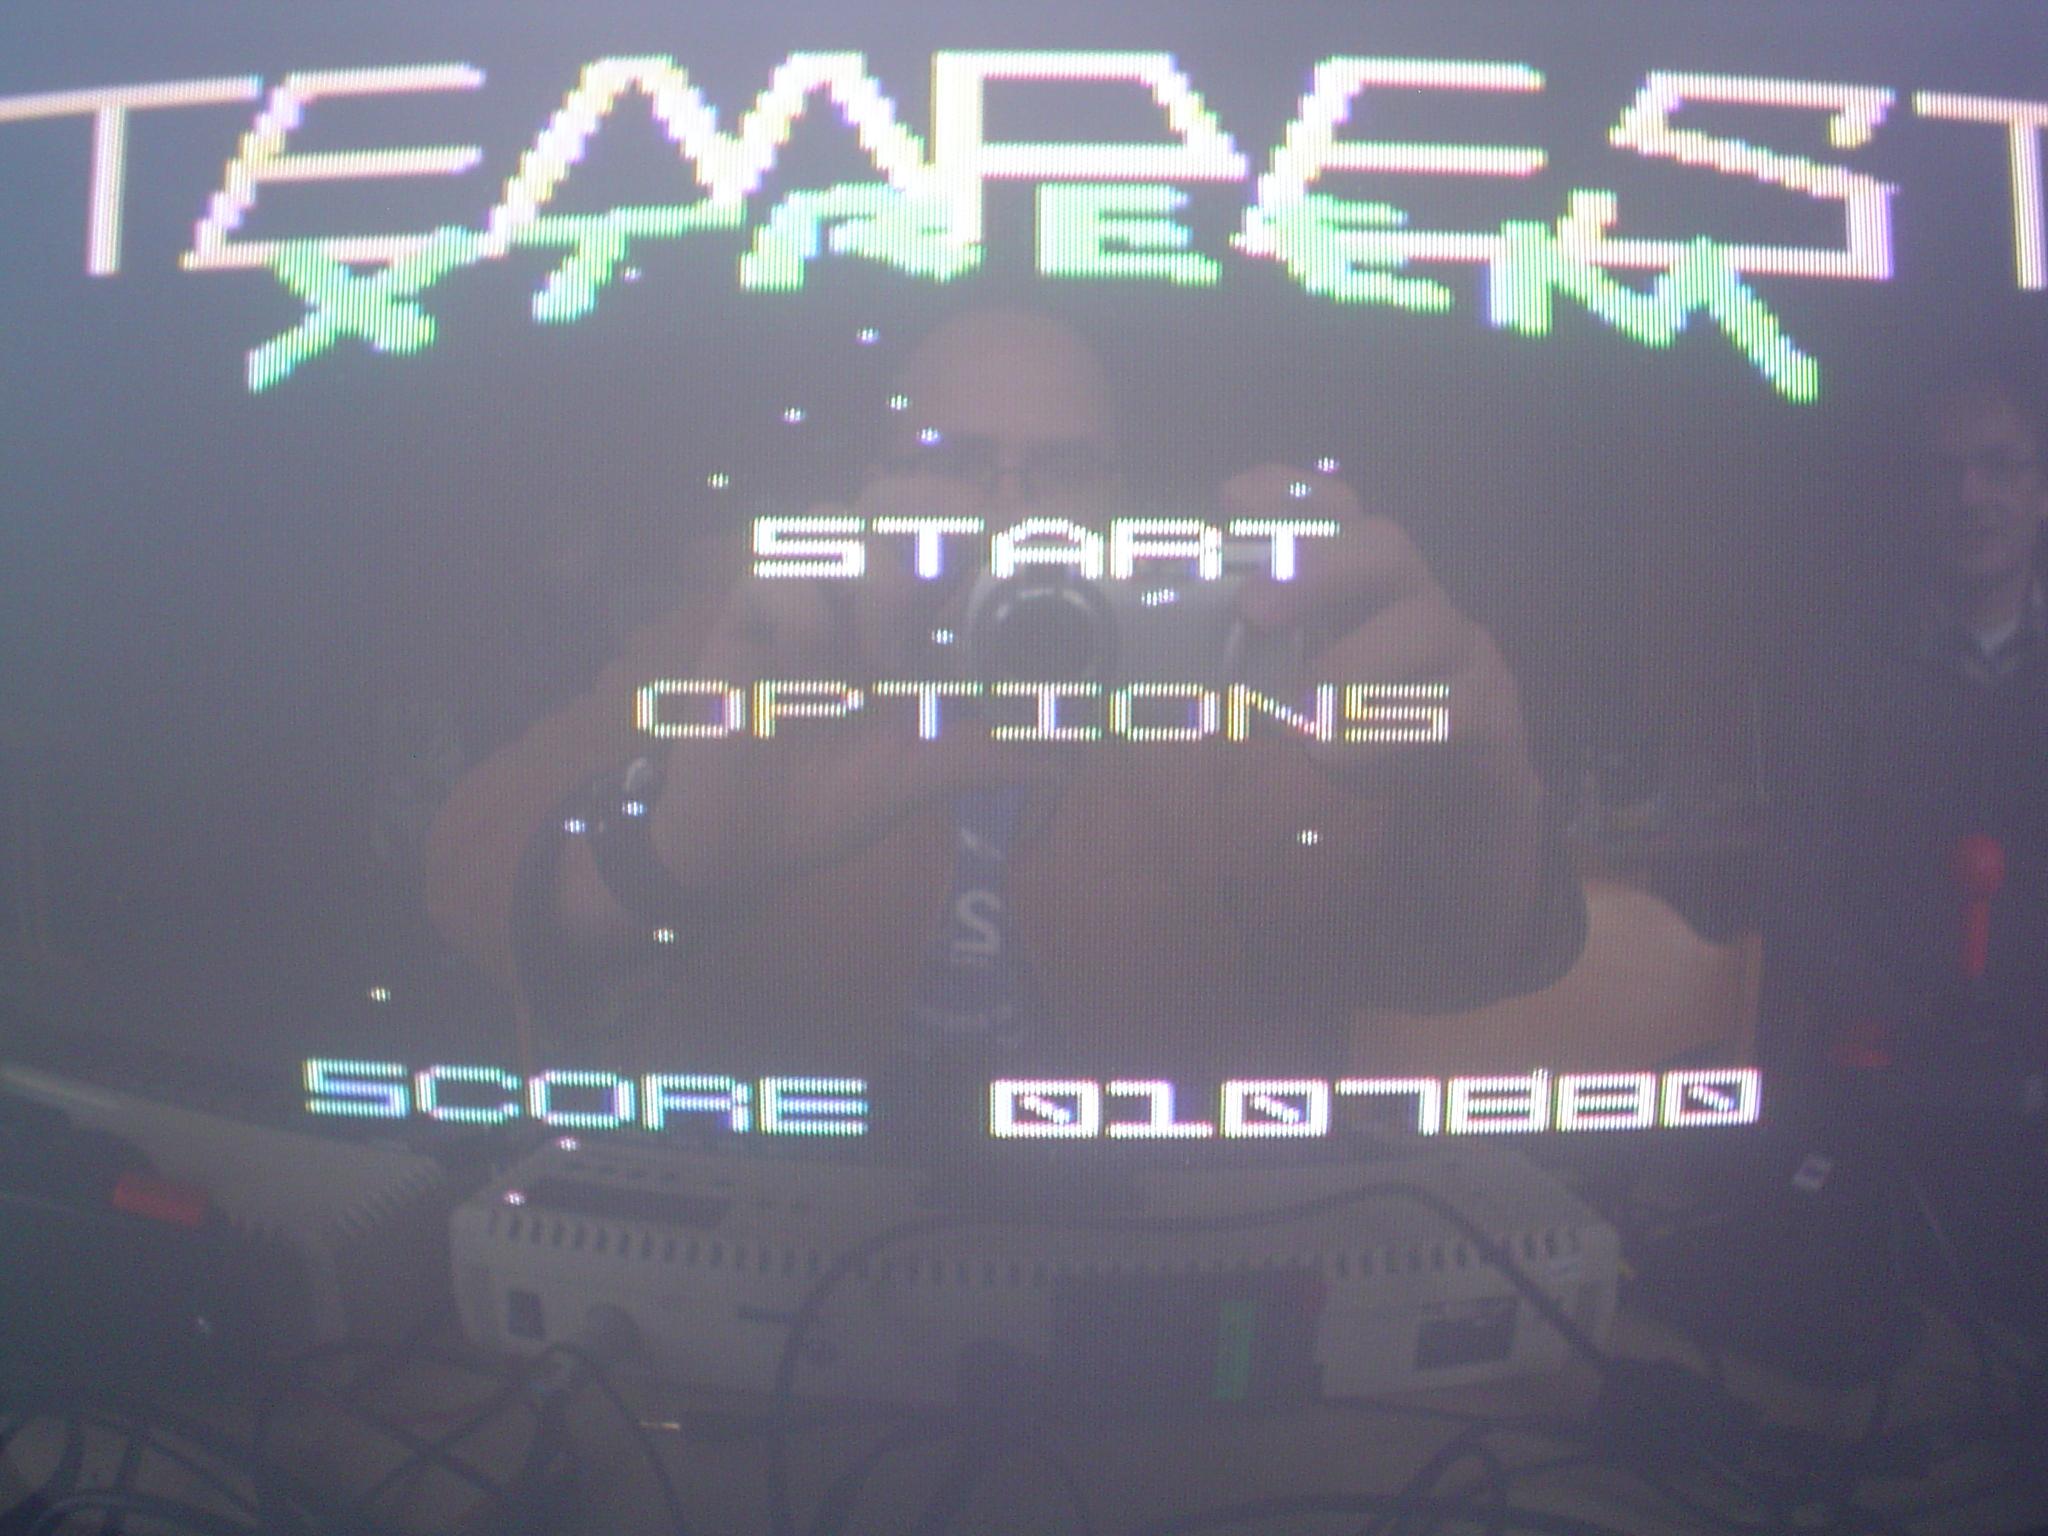 Bunsen: Tempest Xtreem (Atari 400/800/XL/XE) 107,880 points on 2016-04-28 02:53:28